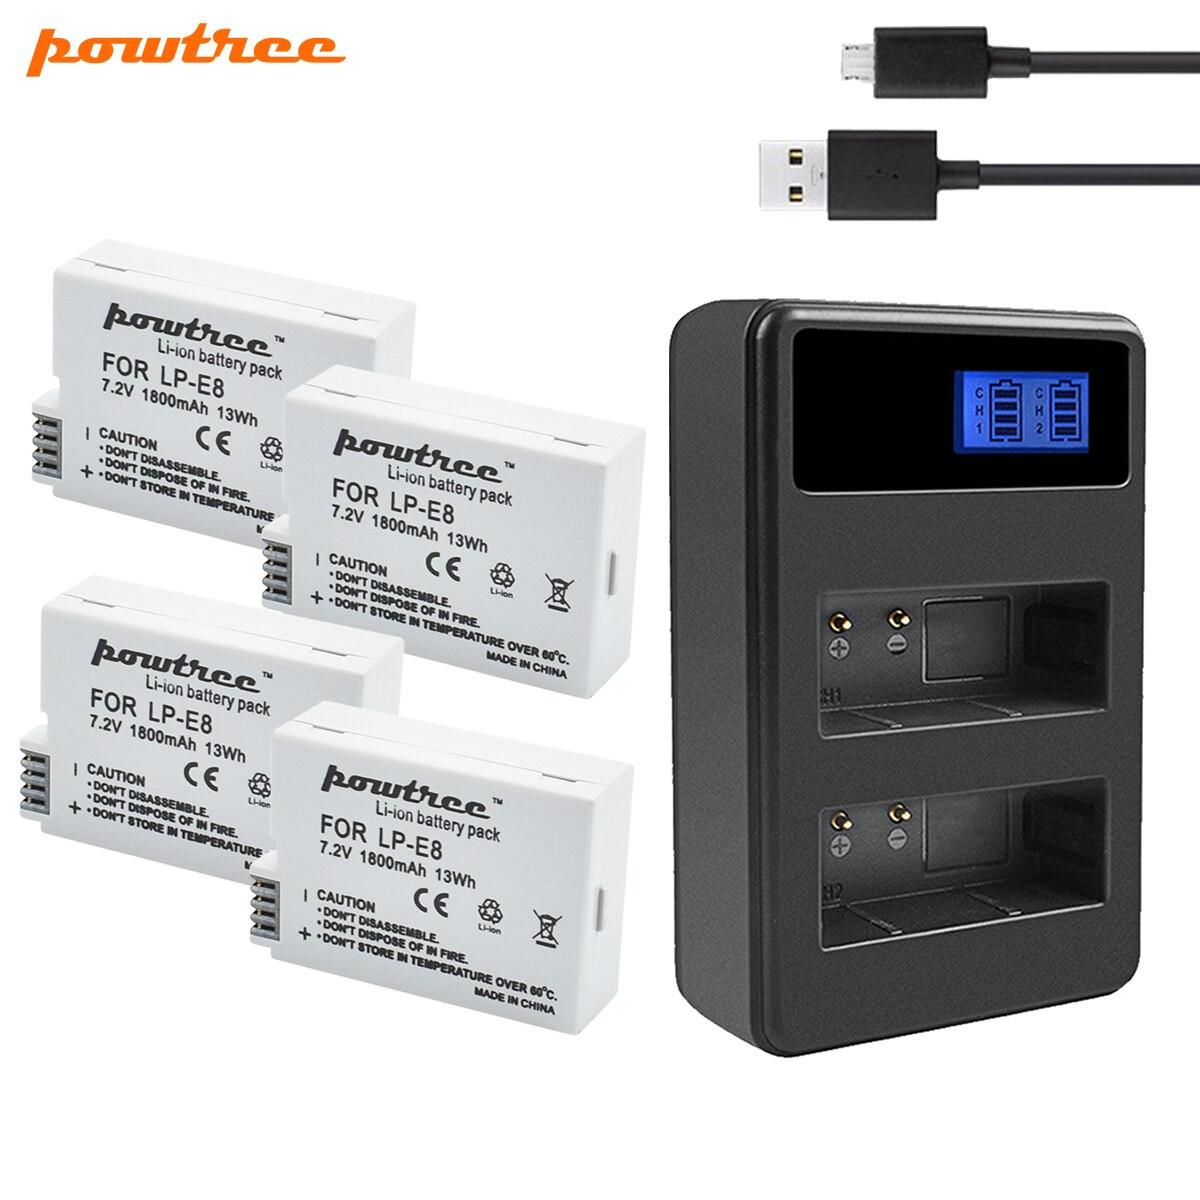 Powtree 1800mah LP-E8 LPE8 LP E8 Battery AKKU+USB Dual Charger For Canon EOS 550D 600D 650D 700D X4 X5 X6i X7i T2i T3i